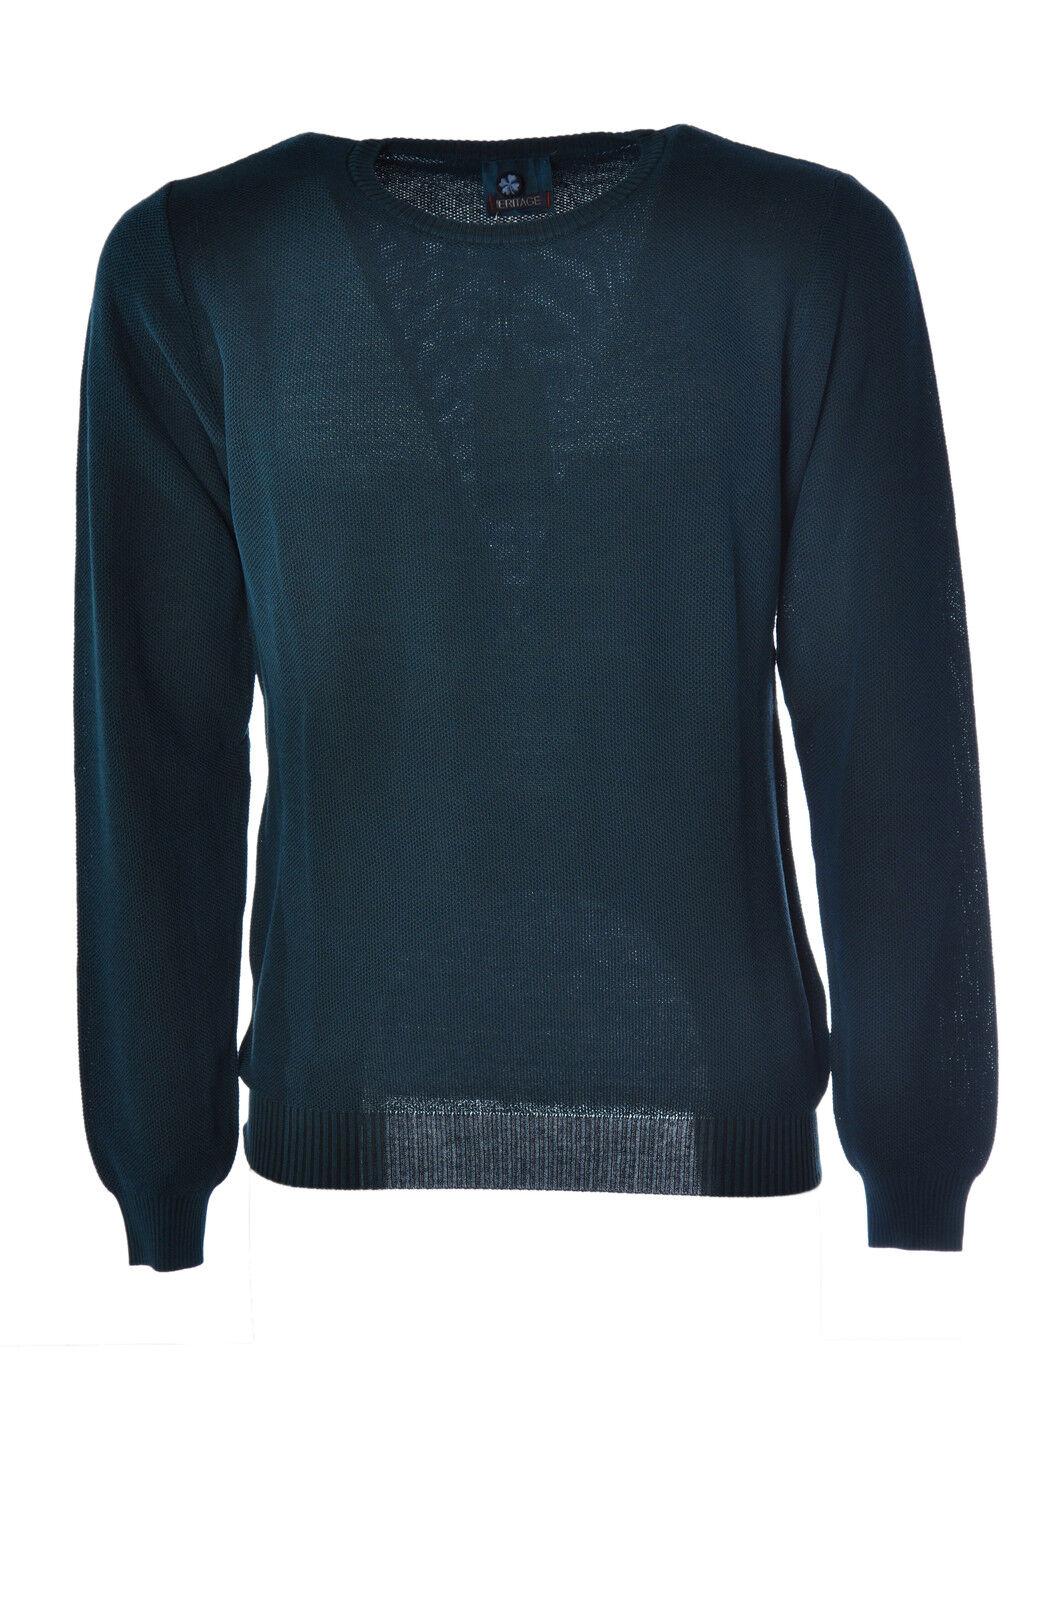 Heritage  -  Sweaters - Male - 50 - Grün - 1605501C162553